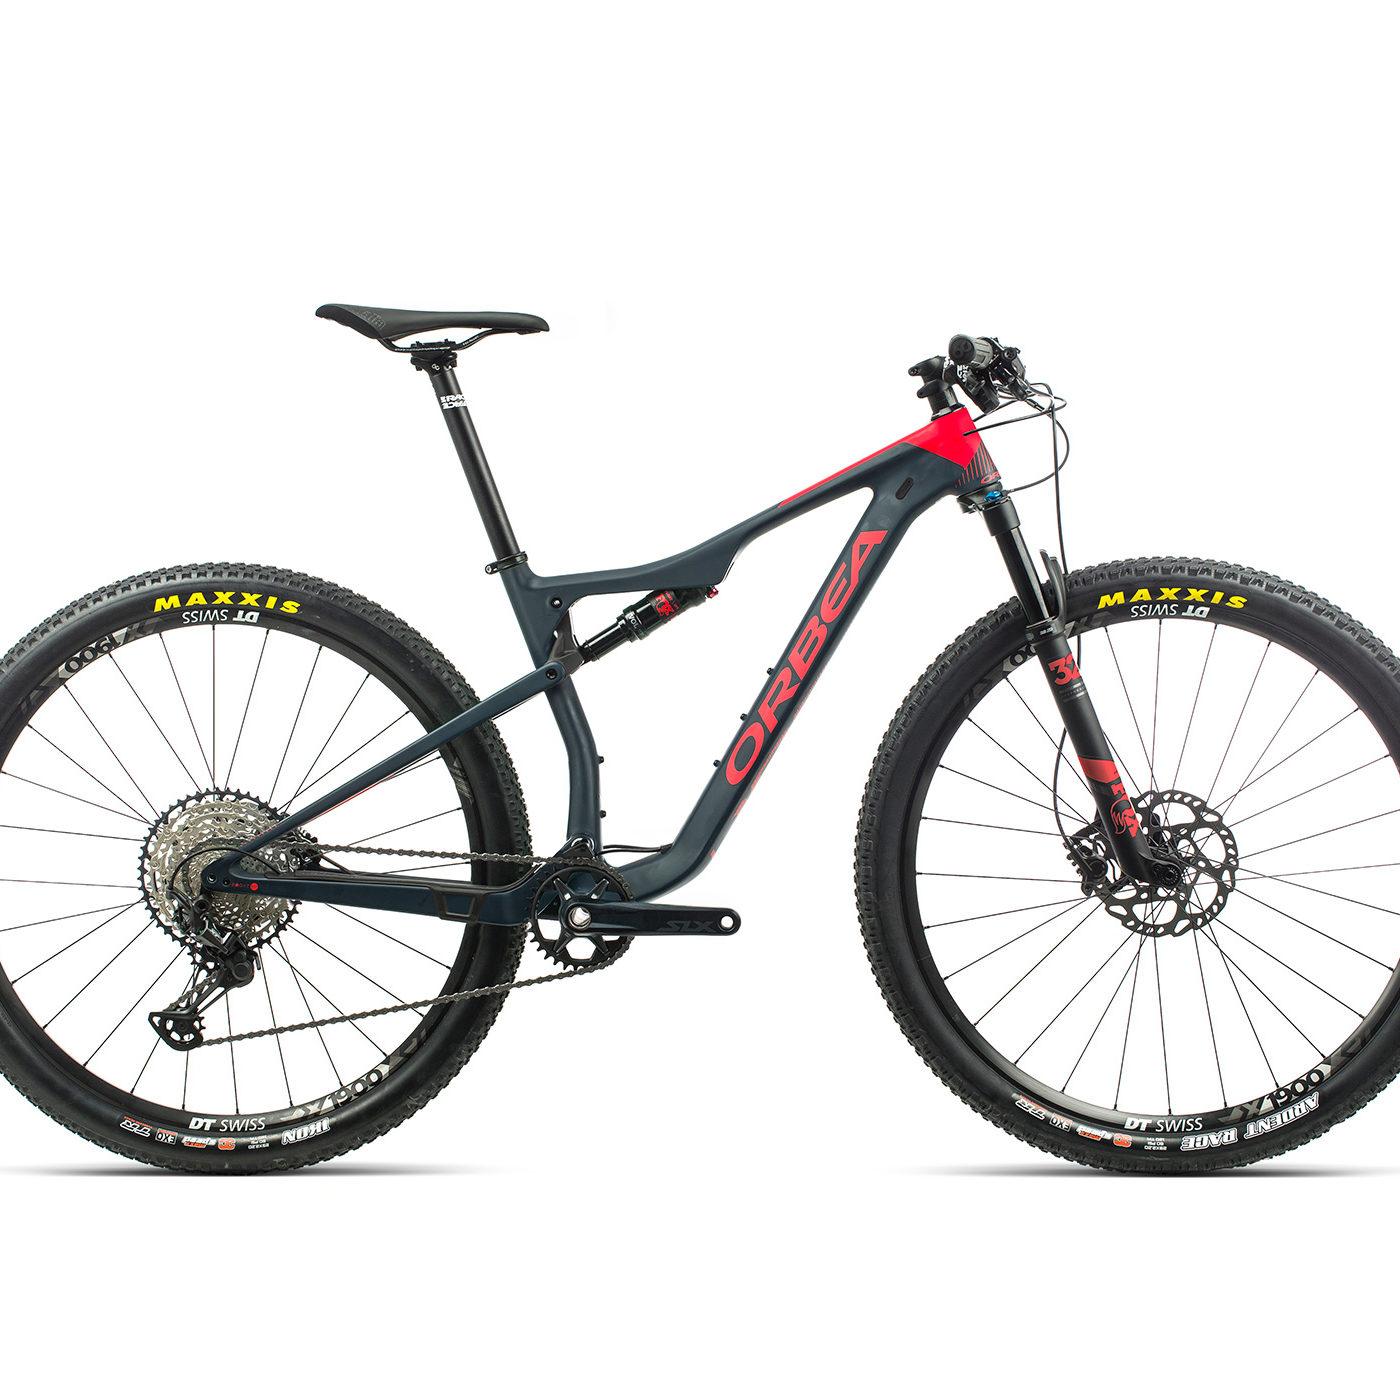 ORBEA OIZ 29 M30 - BLAUW INDIGO / BRIGHT RED (DOF) @G-Bikes